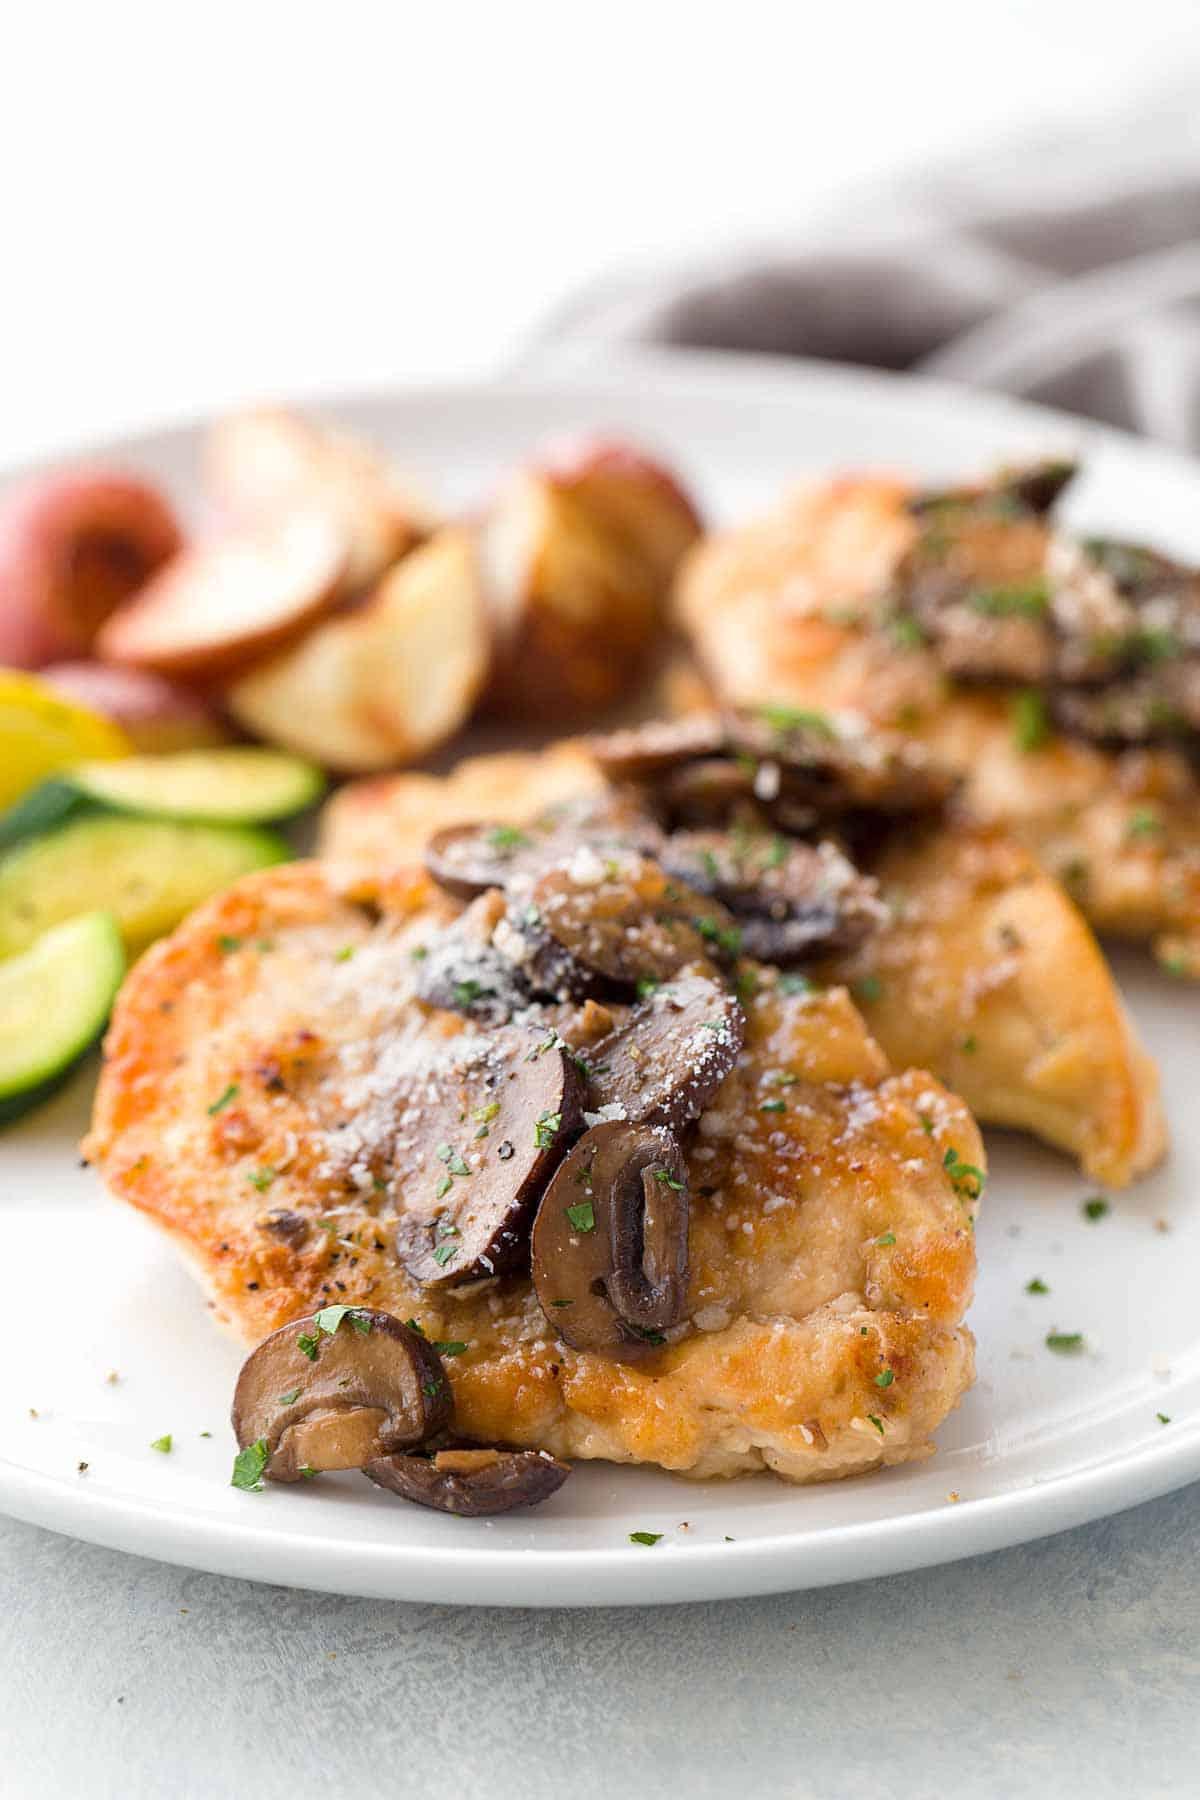 Plate of chicken marsala